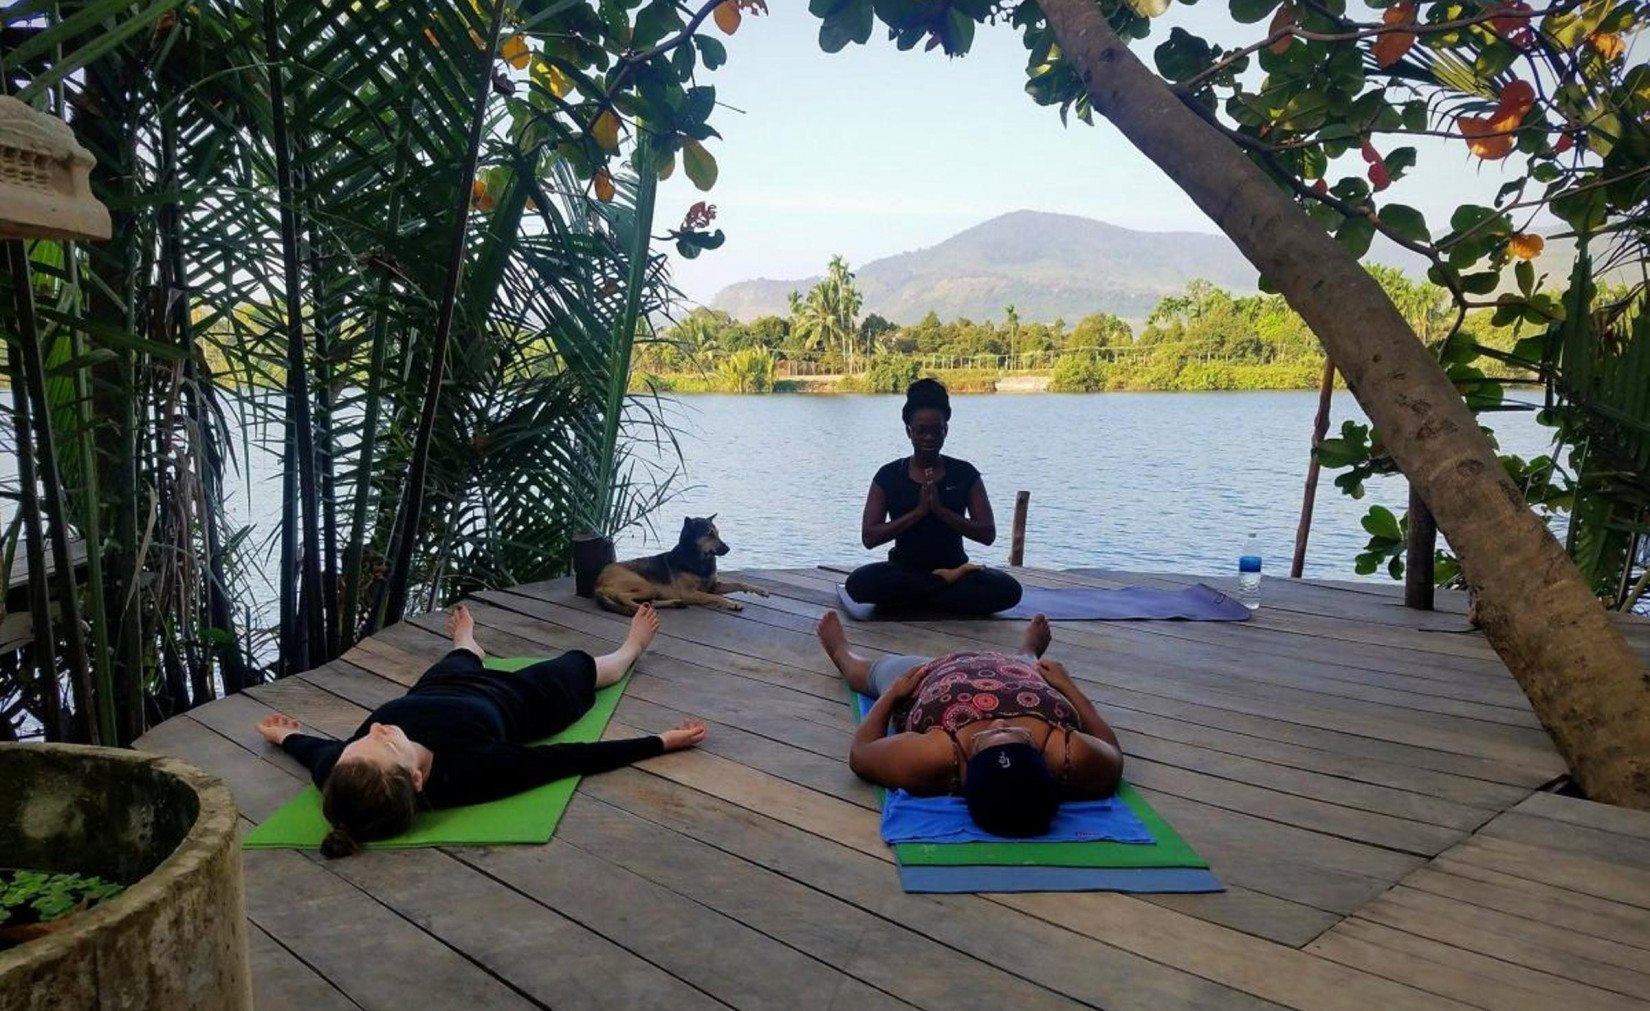 Rondreis Spa, Yoga & Kajakken in Cambodja 16 dagen - Mind, Body & Soul